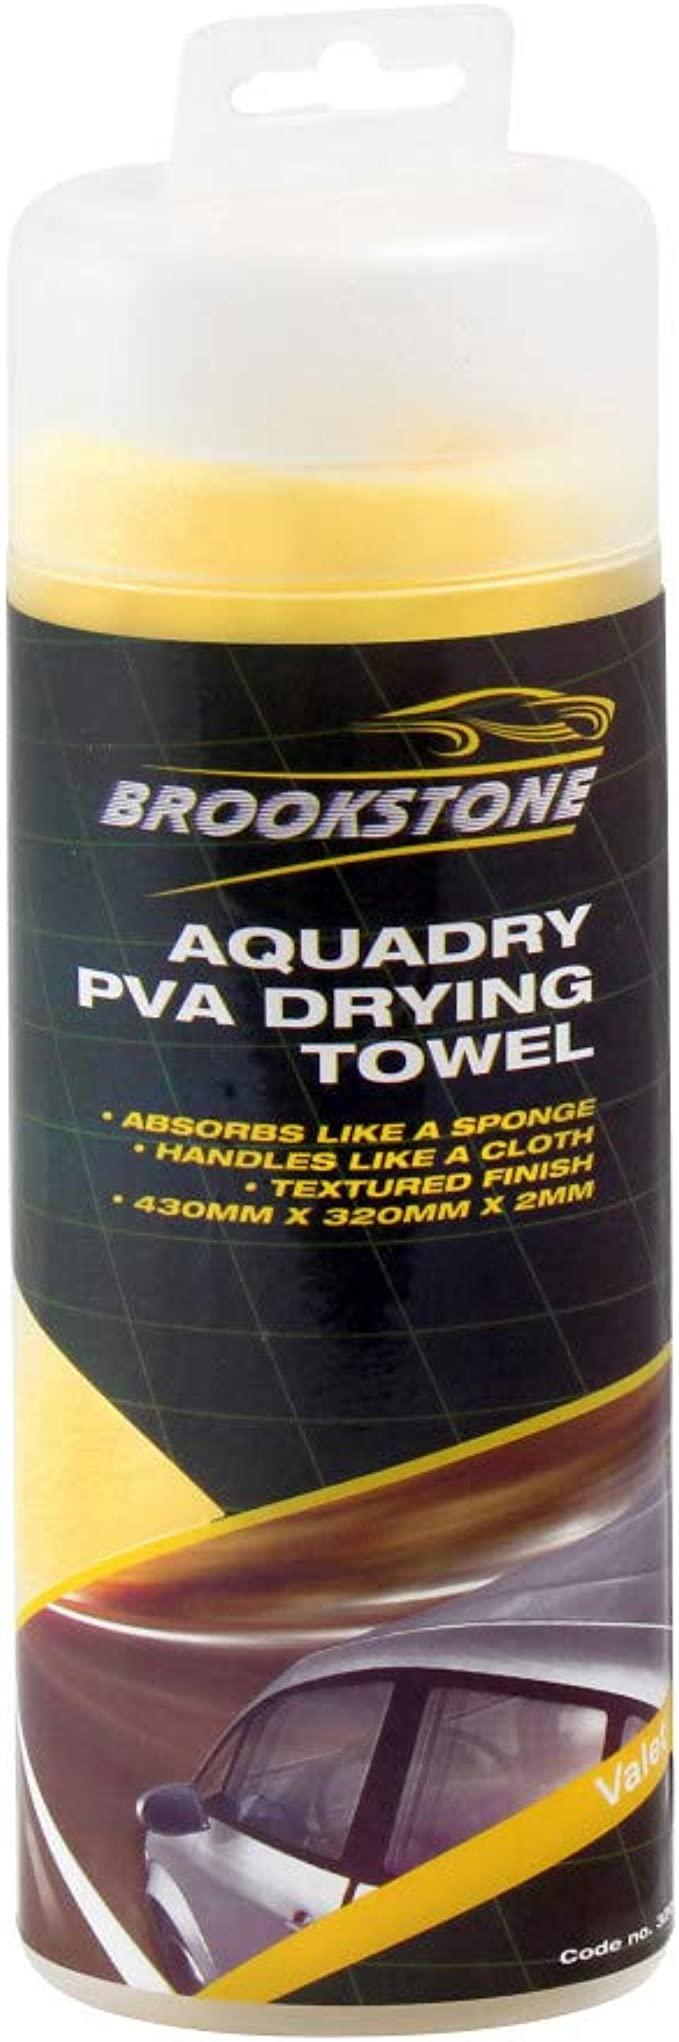 Brookstone Valet Aquadry Pva Drying Towel